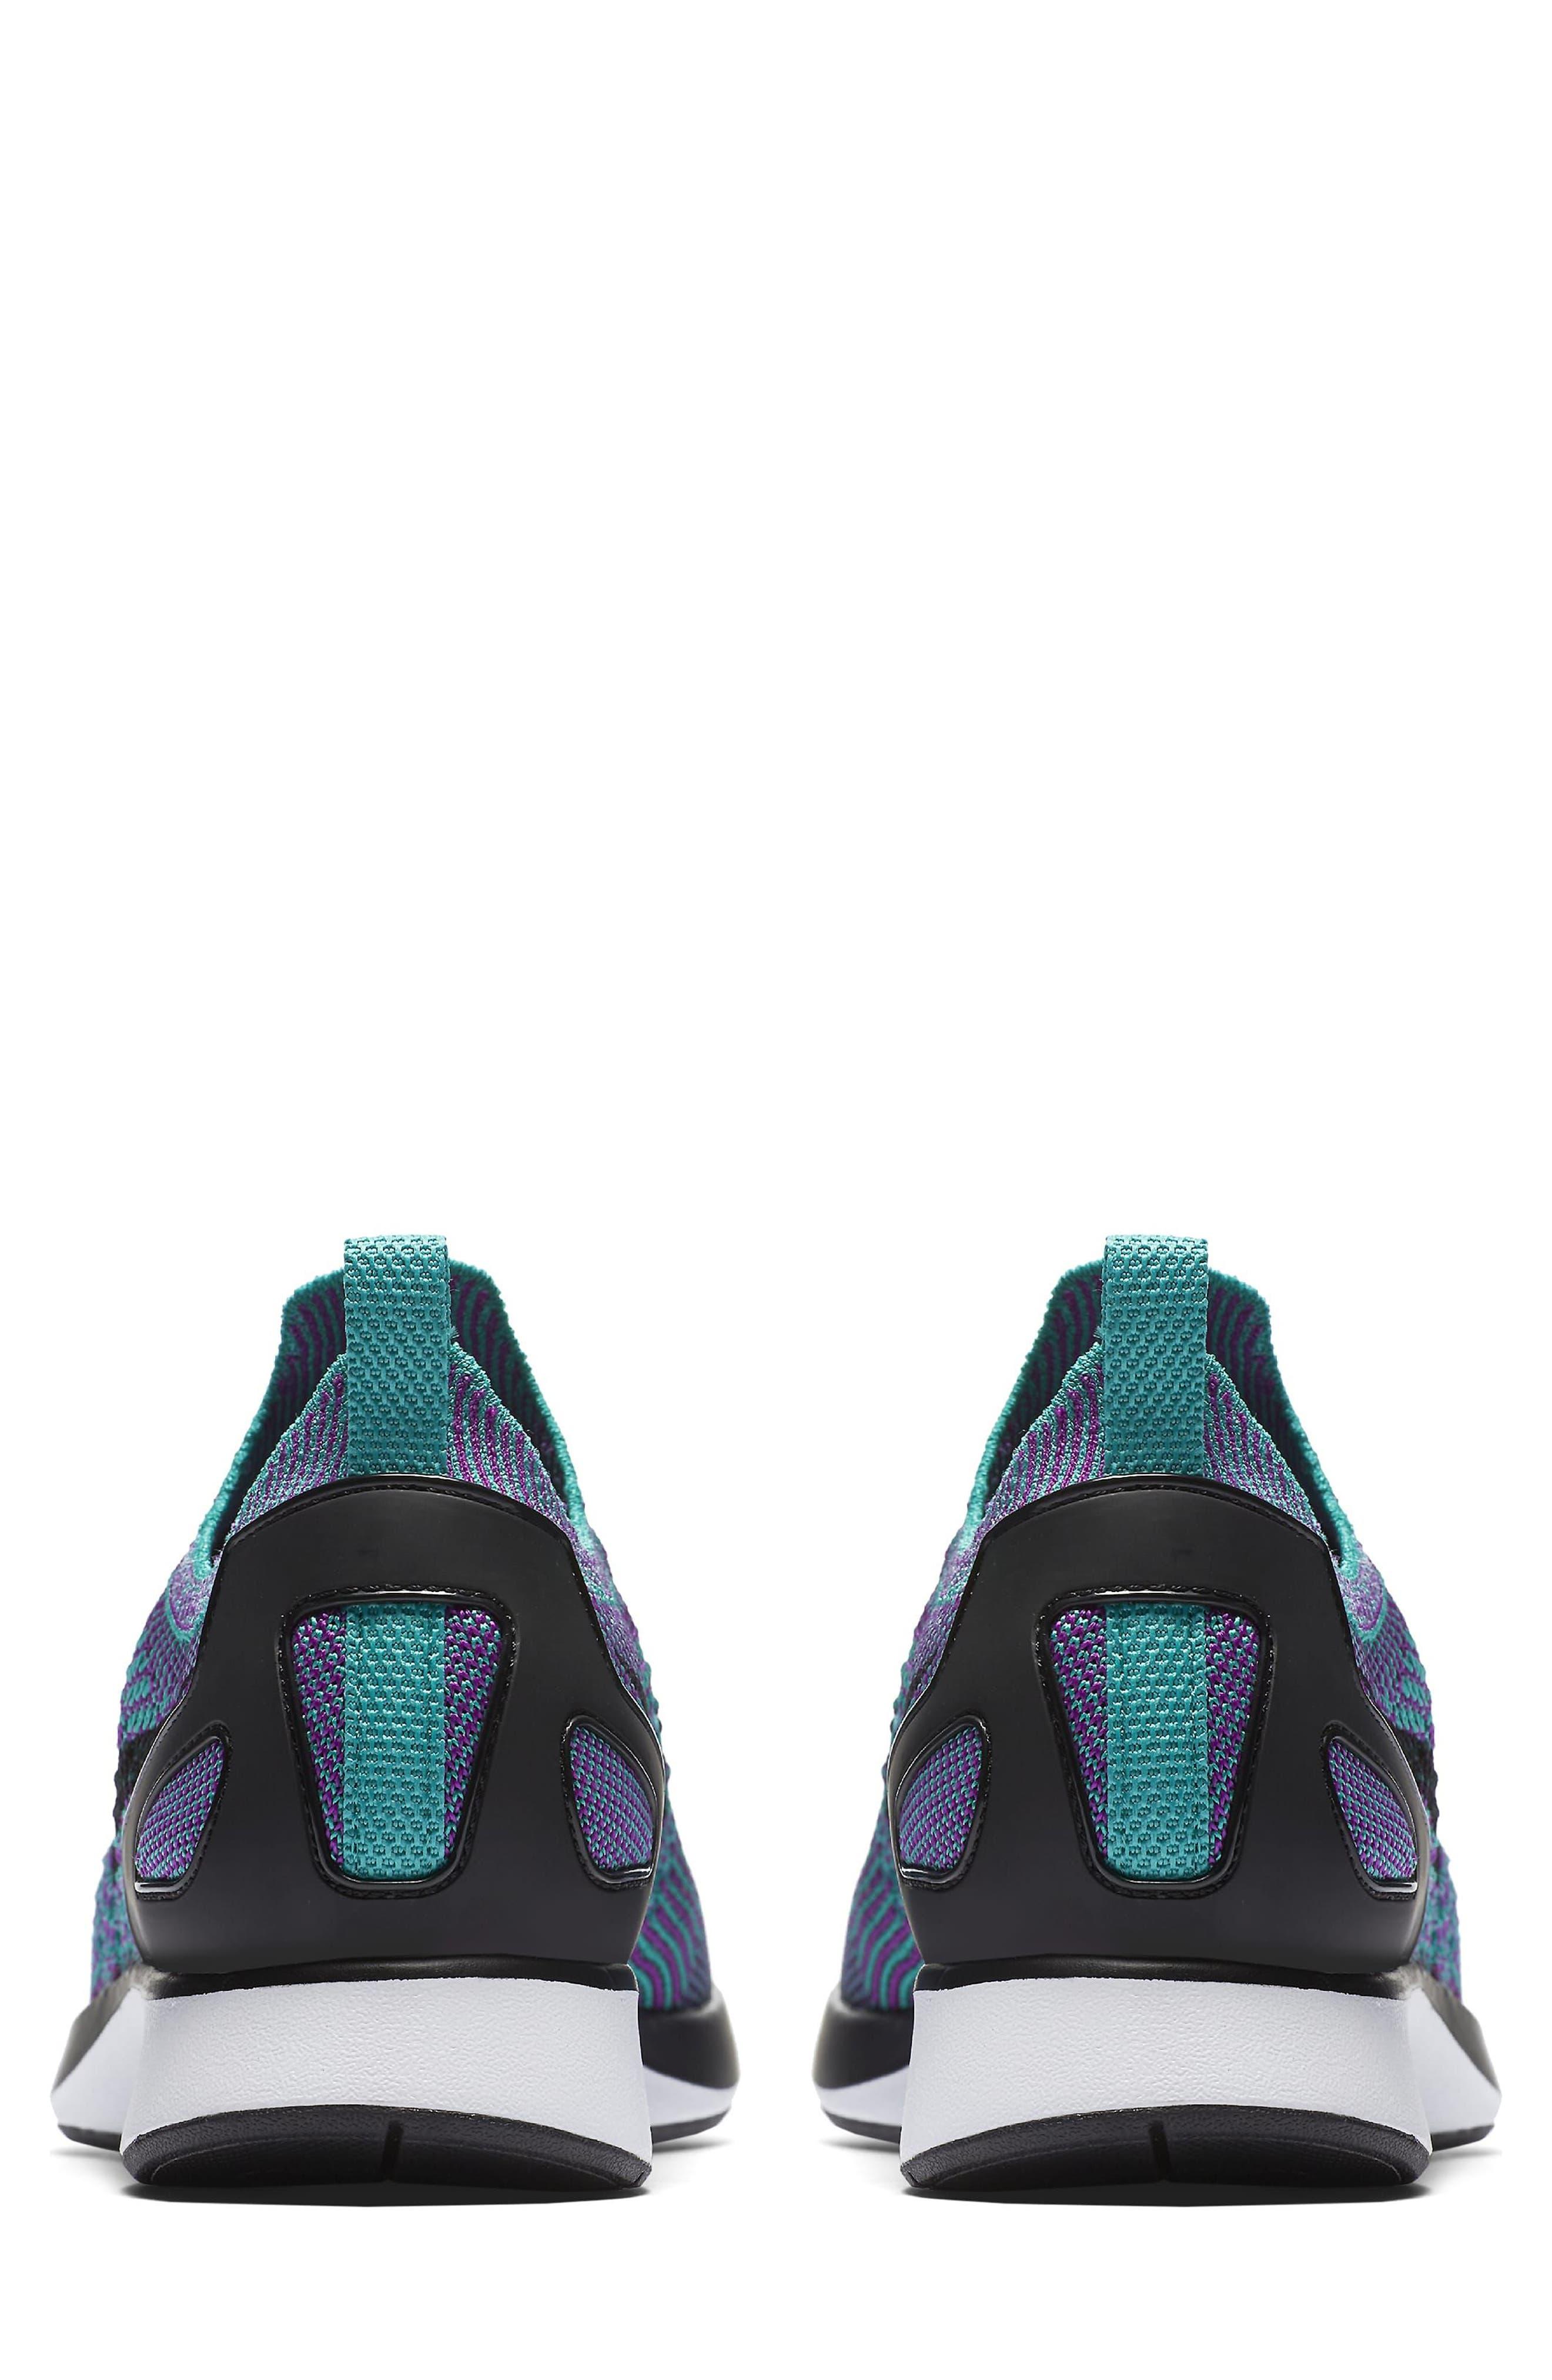 Alternate Image 3  - Nike Air Zoom Mariah Flyknit Racer Sneaker (Women)